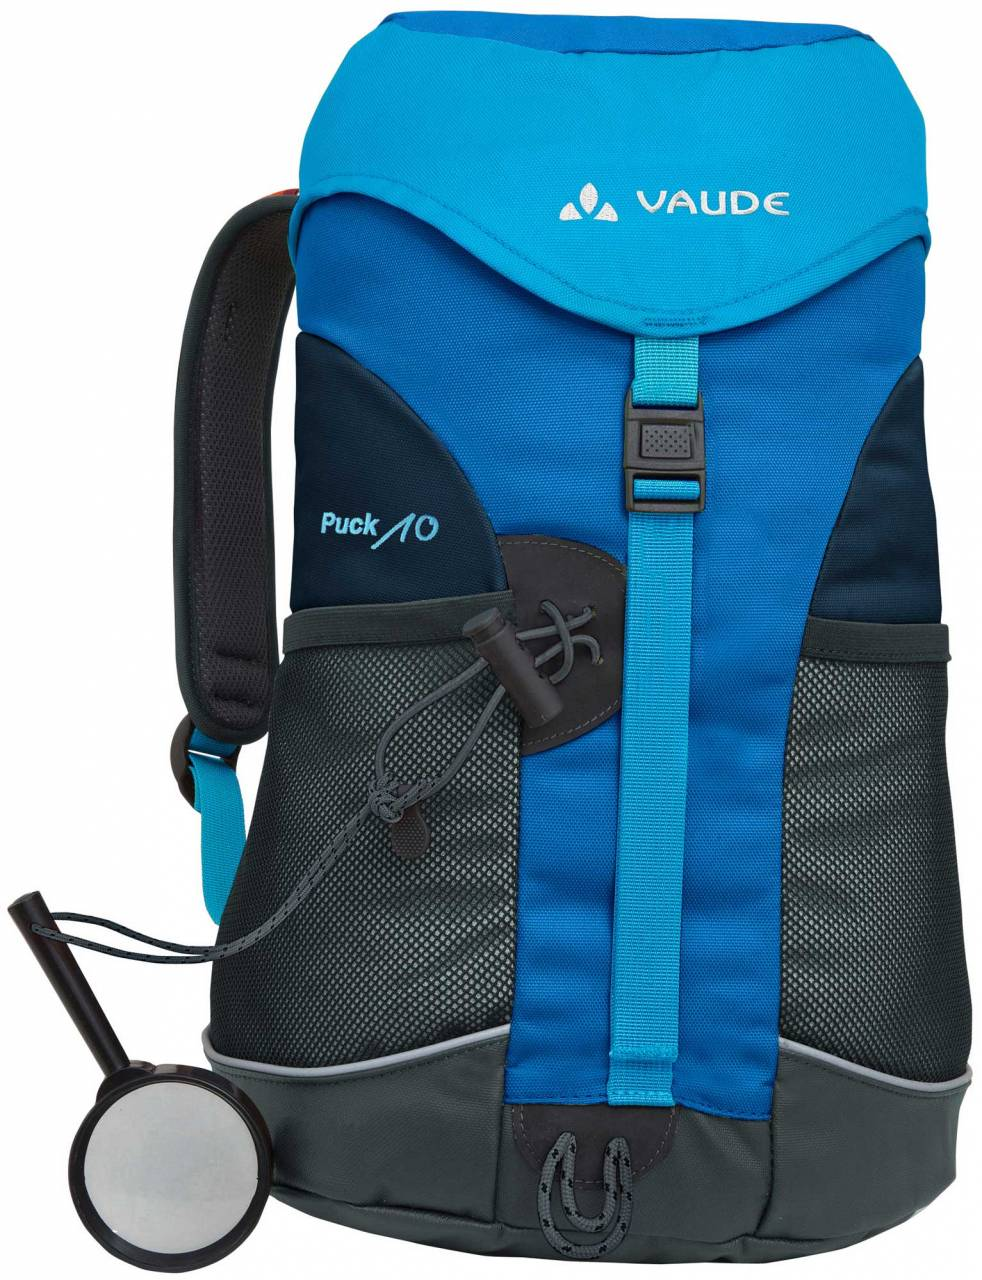 Vaude Puck 10 marine/blue